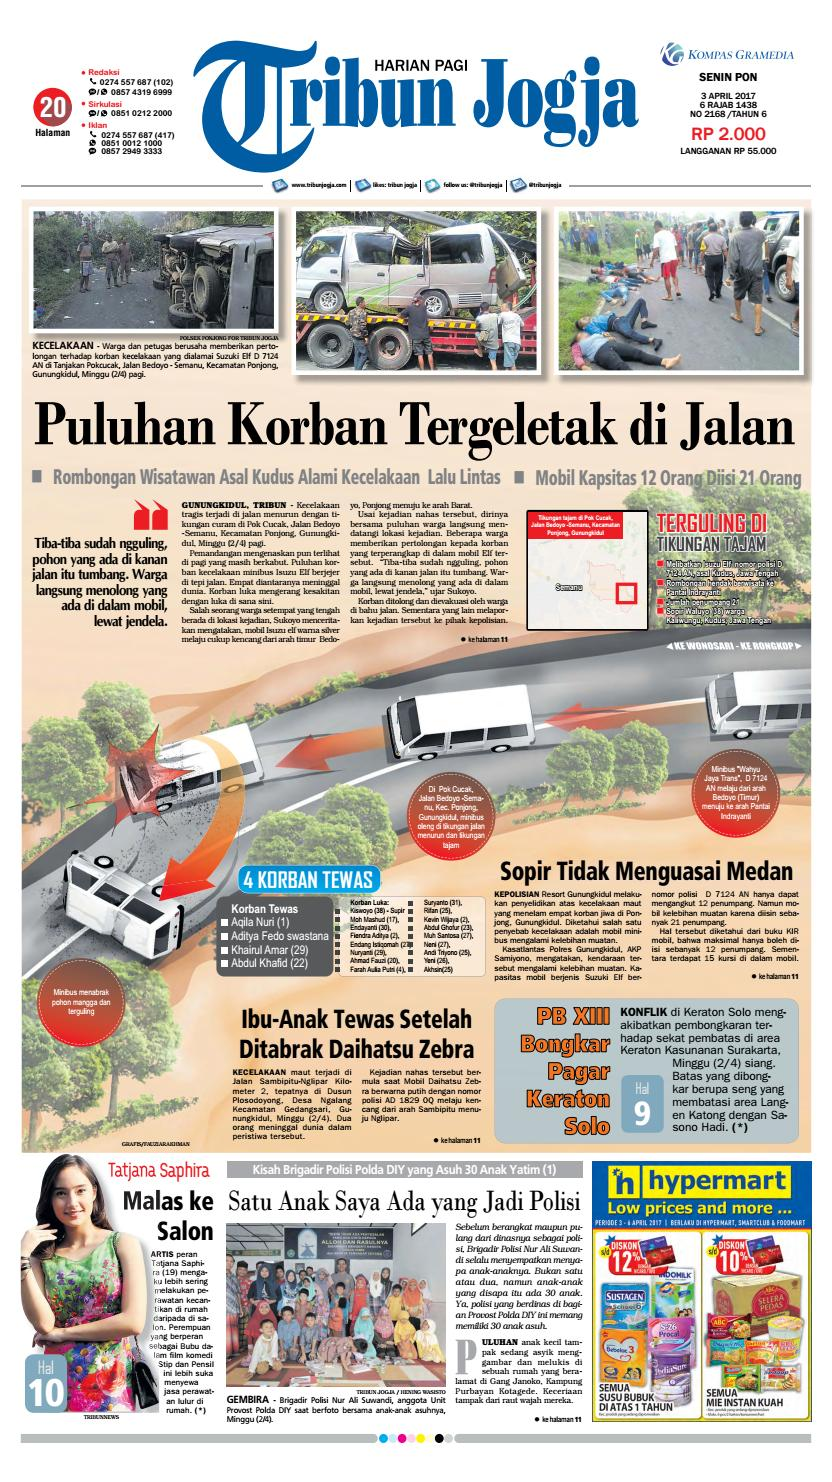 Tribunjogja 03 04 2017 By Tribun Jogja Issuu Produk Ukm Bumn Batik Tulis Warna Alam Ra Ampamp